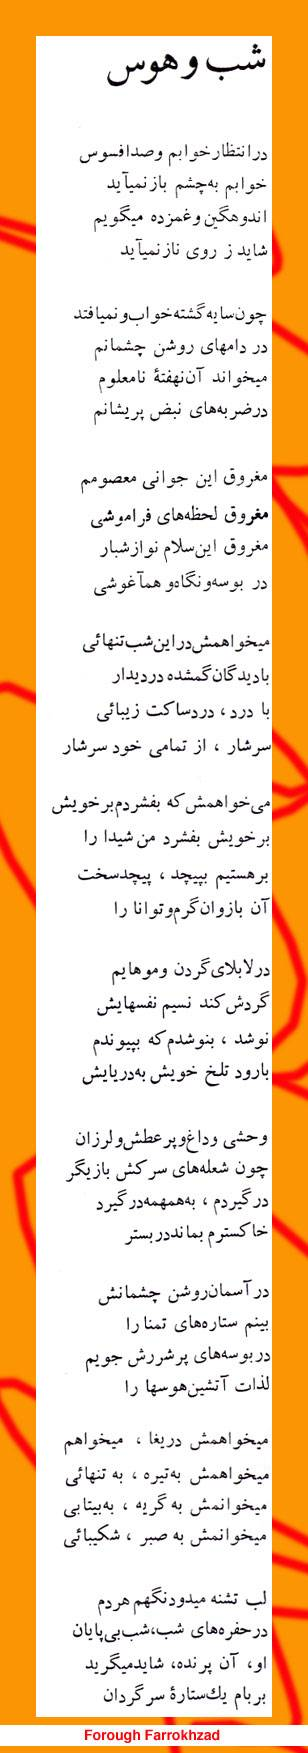 Forough Farrokhzad poems